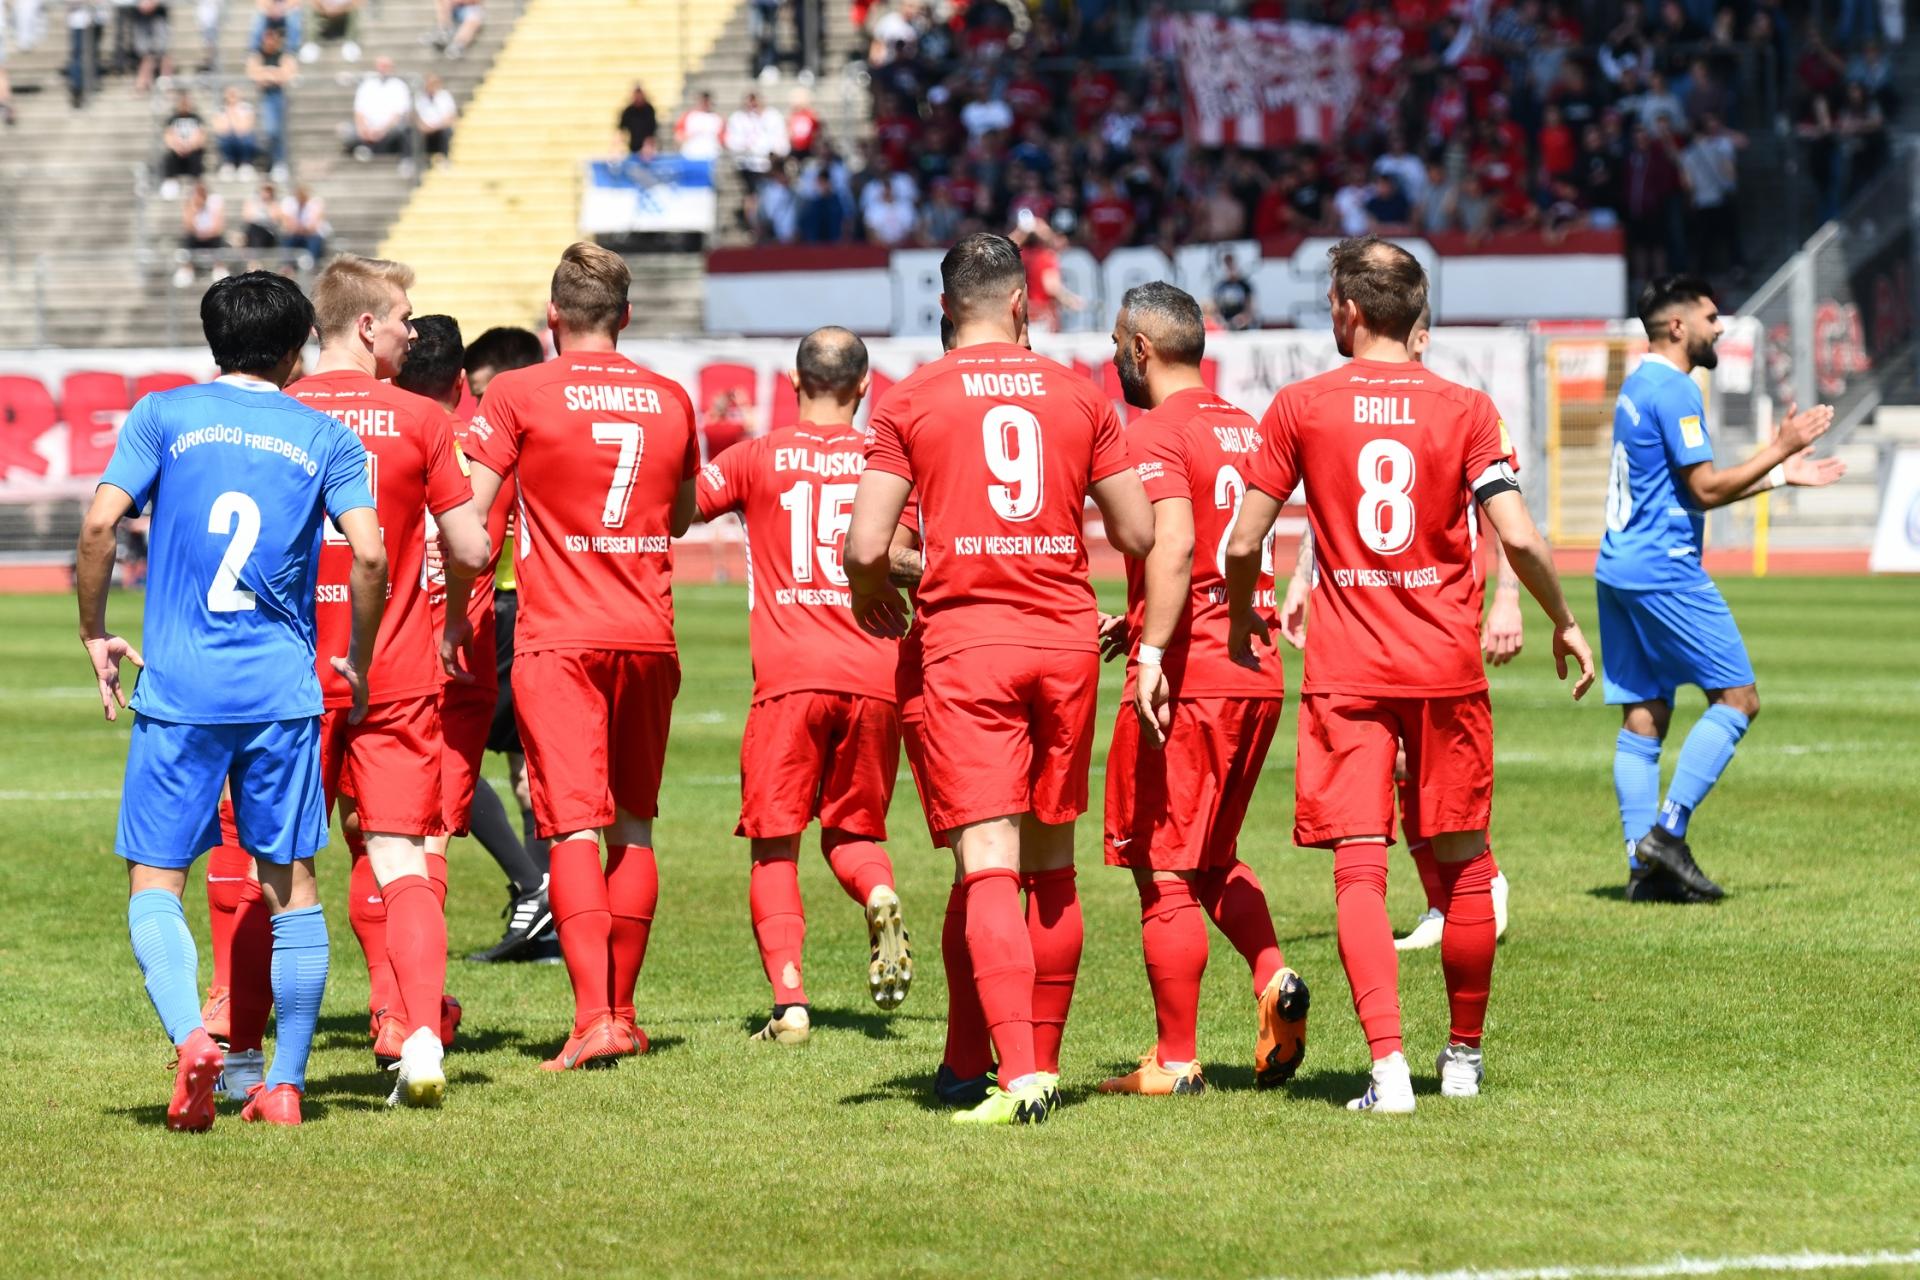 Lotto Hessenliga 2018/2019, KSV Hessen Kassel, T�rk G�c� Friedberg, Endstand 4:0; Jubel zum 1:0